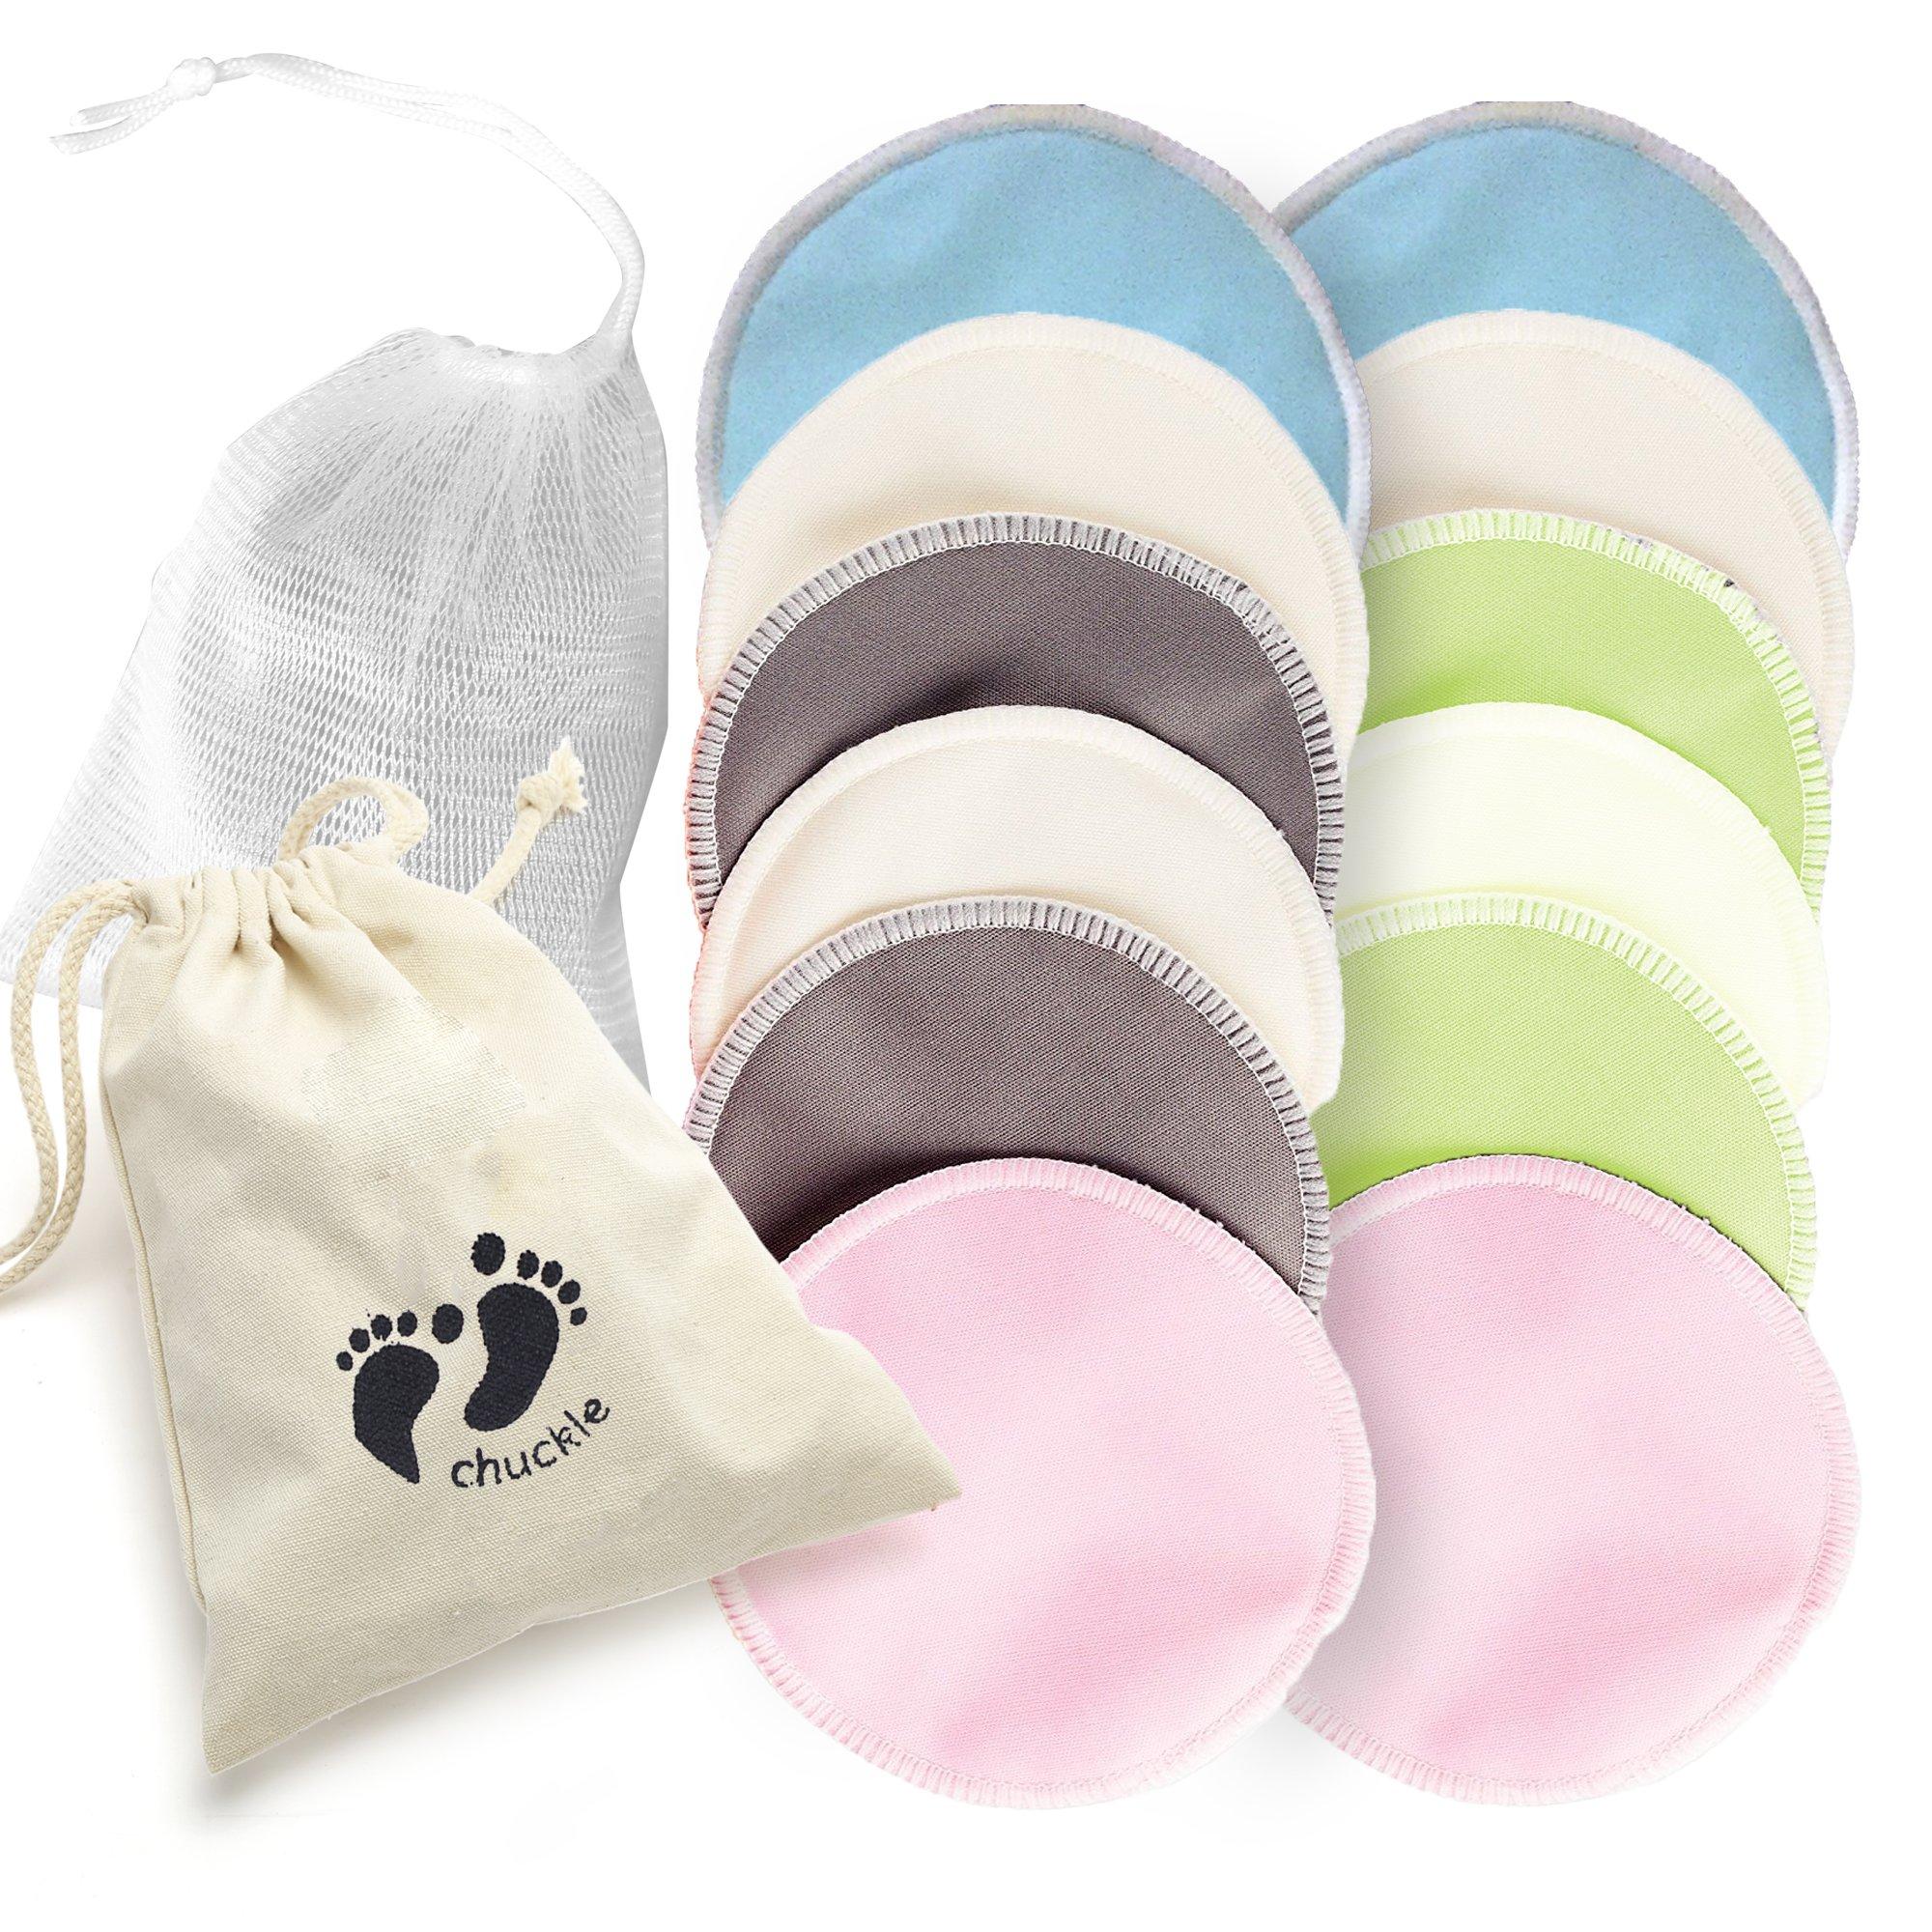 12 Premium Almohadillas de Lactancia de Bambú Orgánico - Discos Lactancia Lavables Reutilizables - Ultra Absorbente